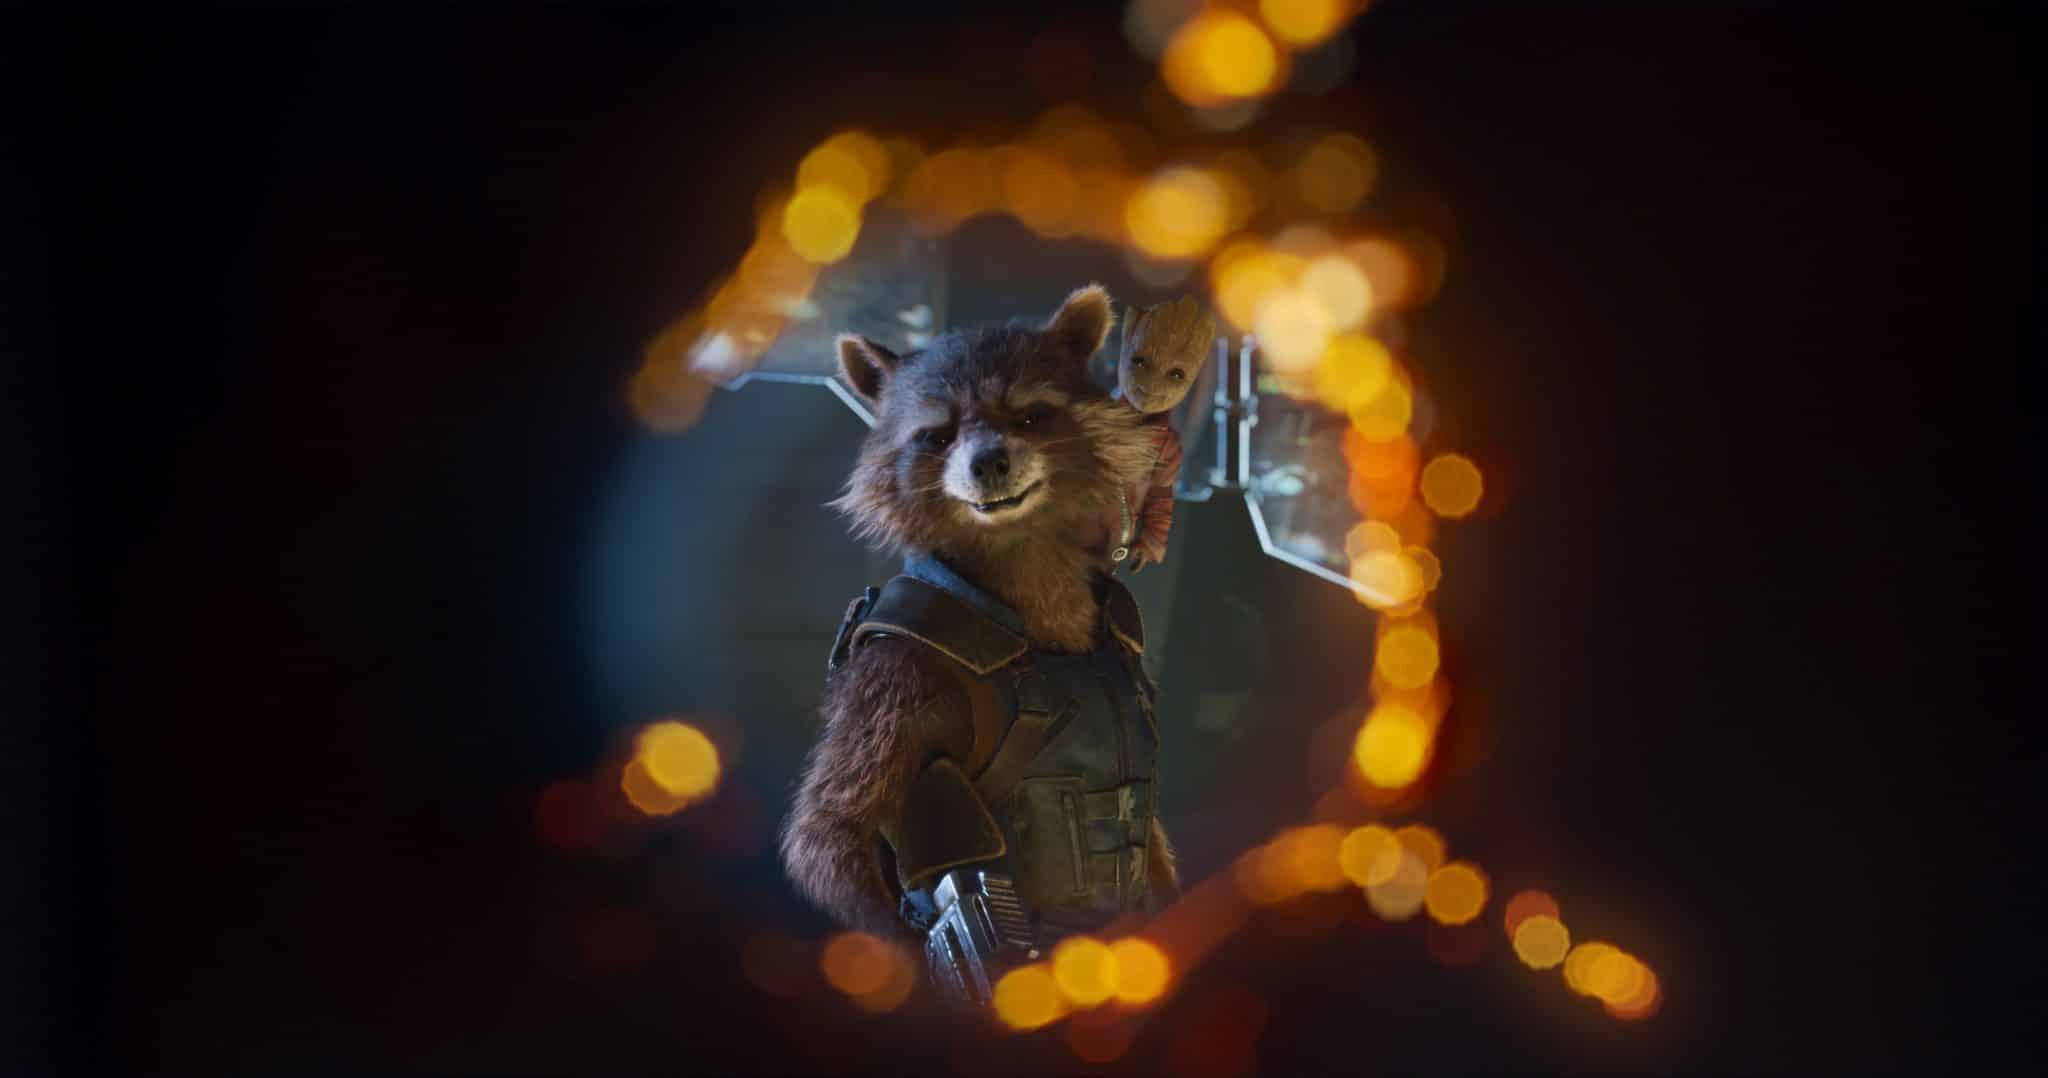 fotky z Guardians of the Galaxy 2